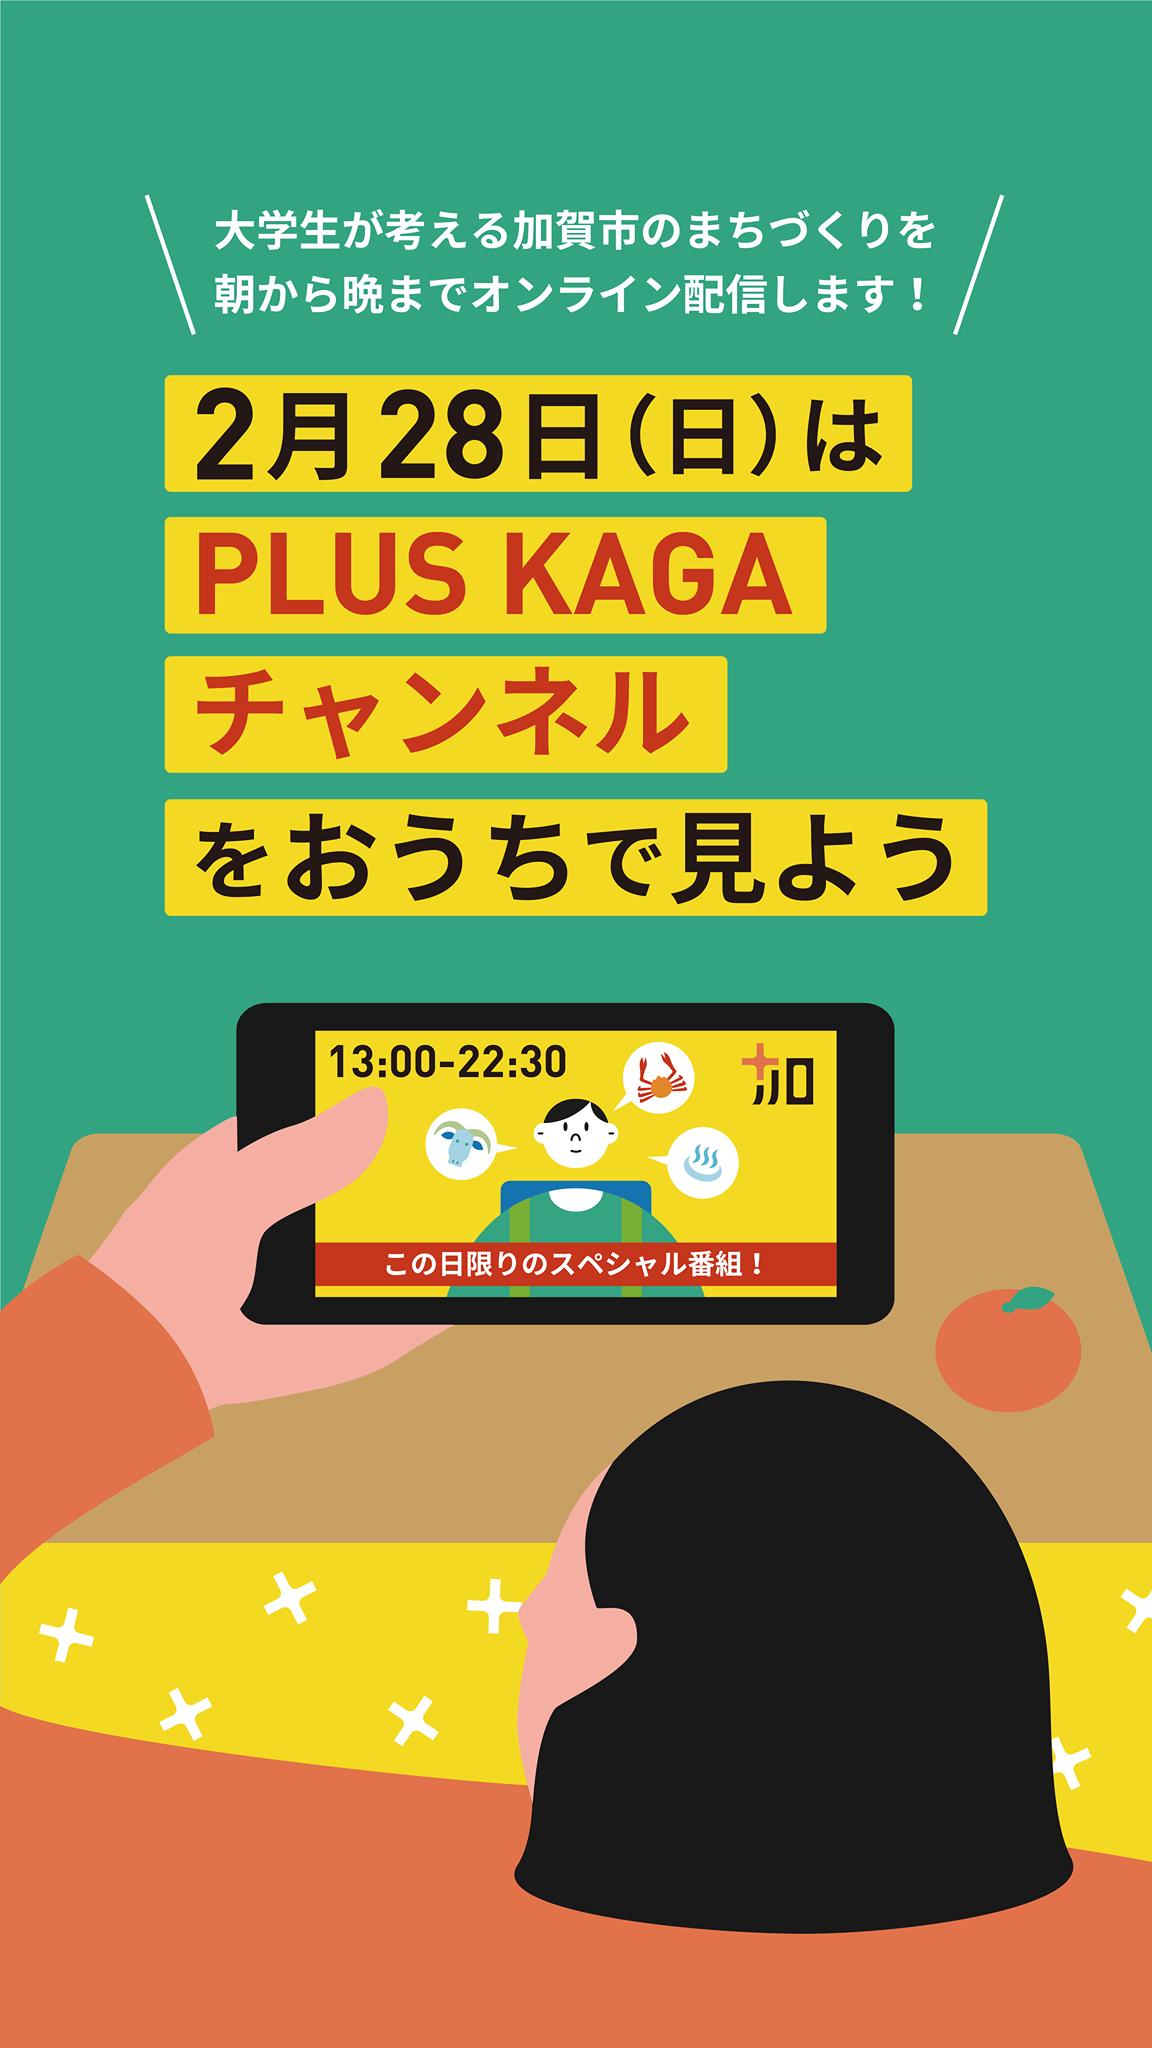 http://ud.t.u-tokyo.ac.jp/blog/_images/PLUSKAGA1.png